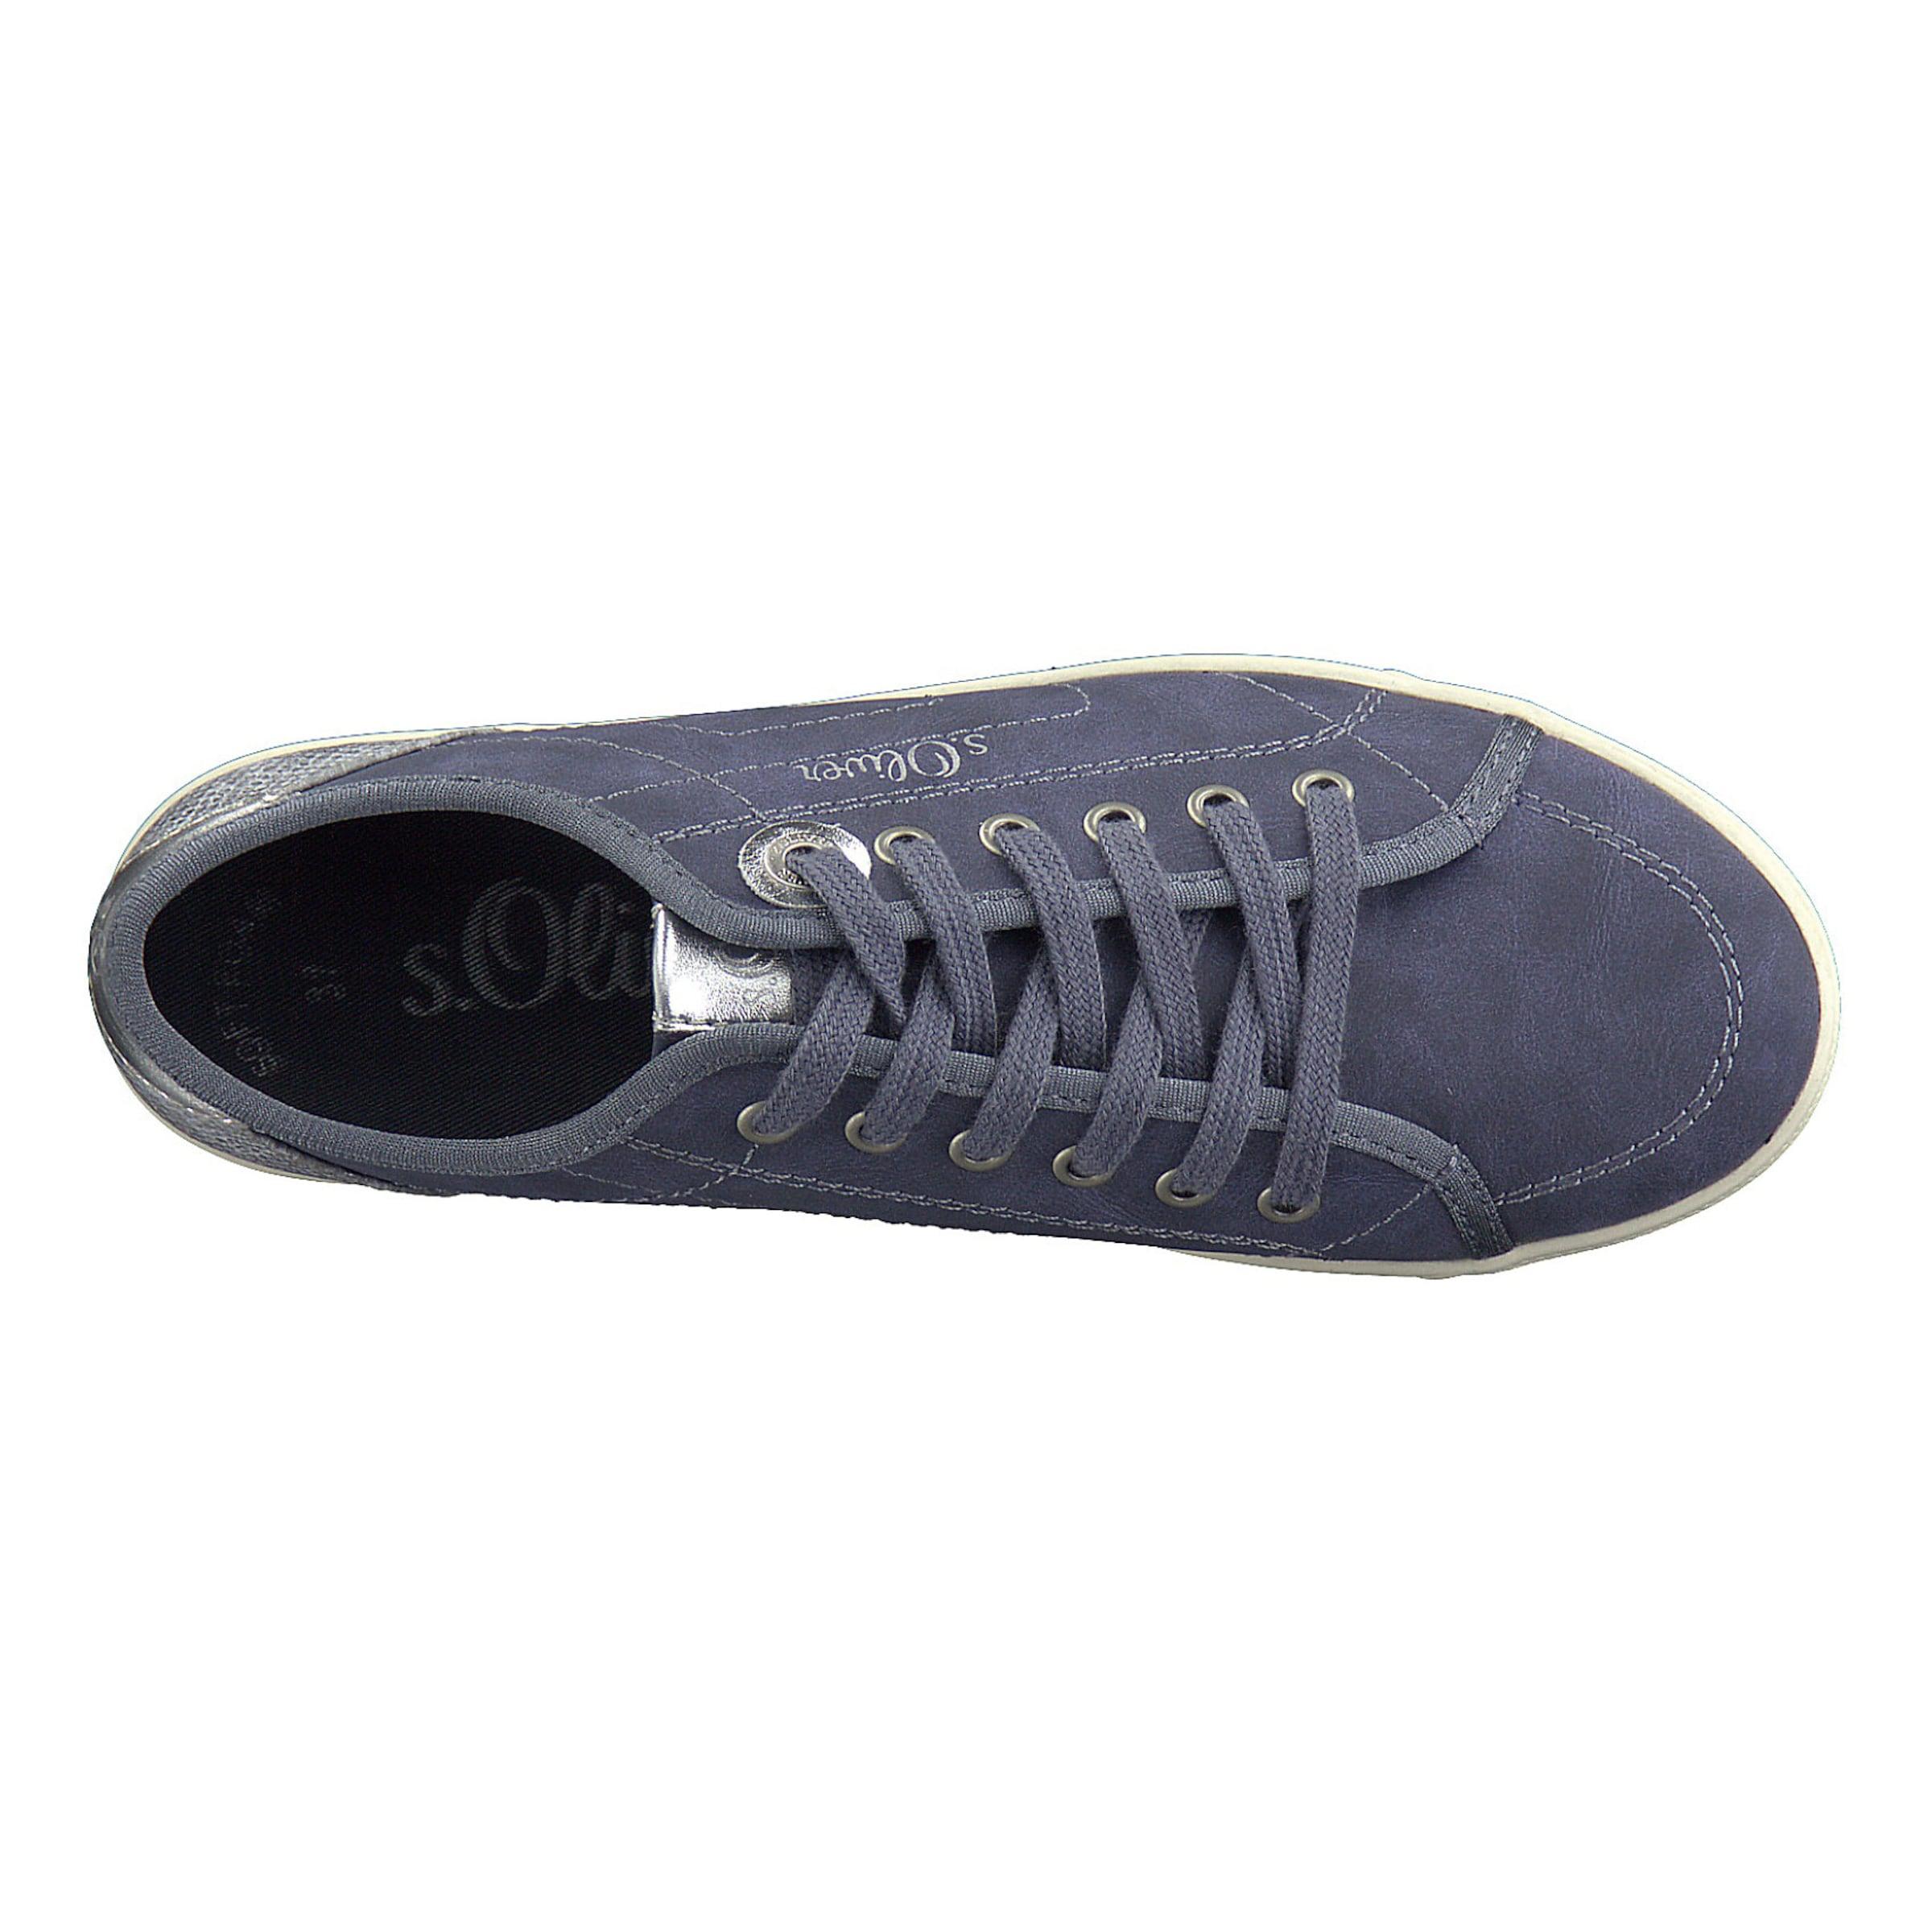 Sneakers In Red oliver Low NachtblauTaubenblau Label S ZTuPkOiX